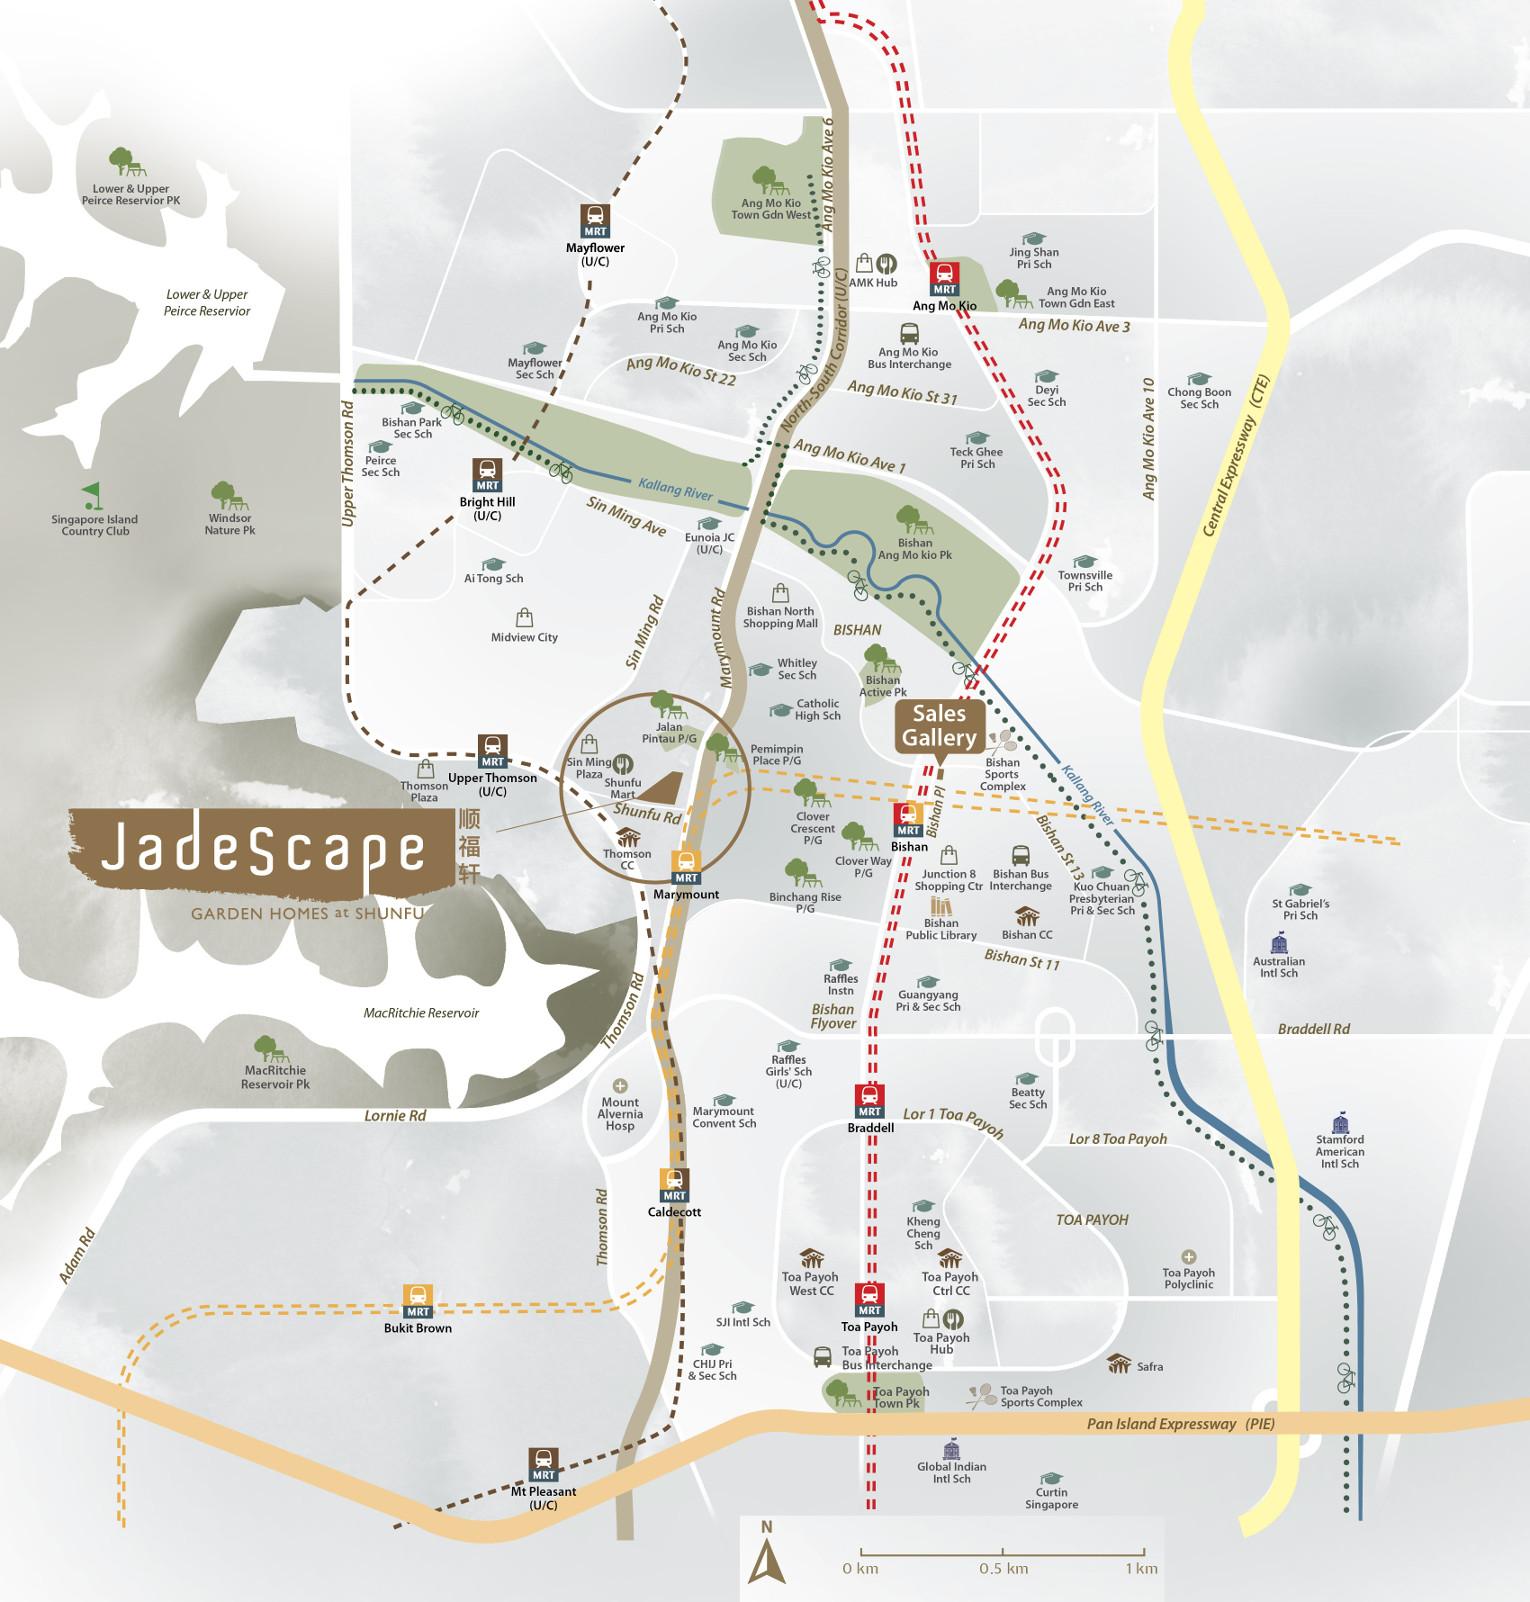 JadeScape Location Map Amenities